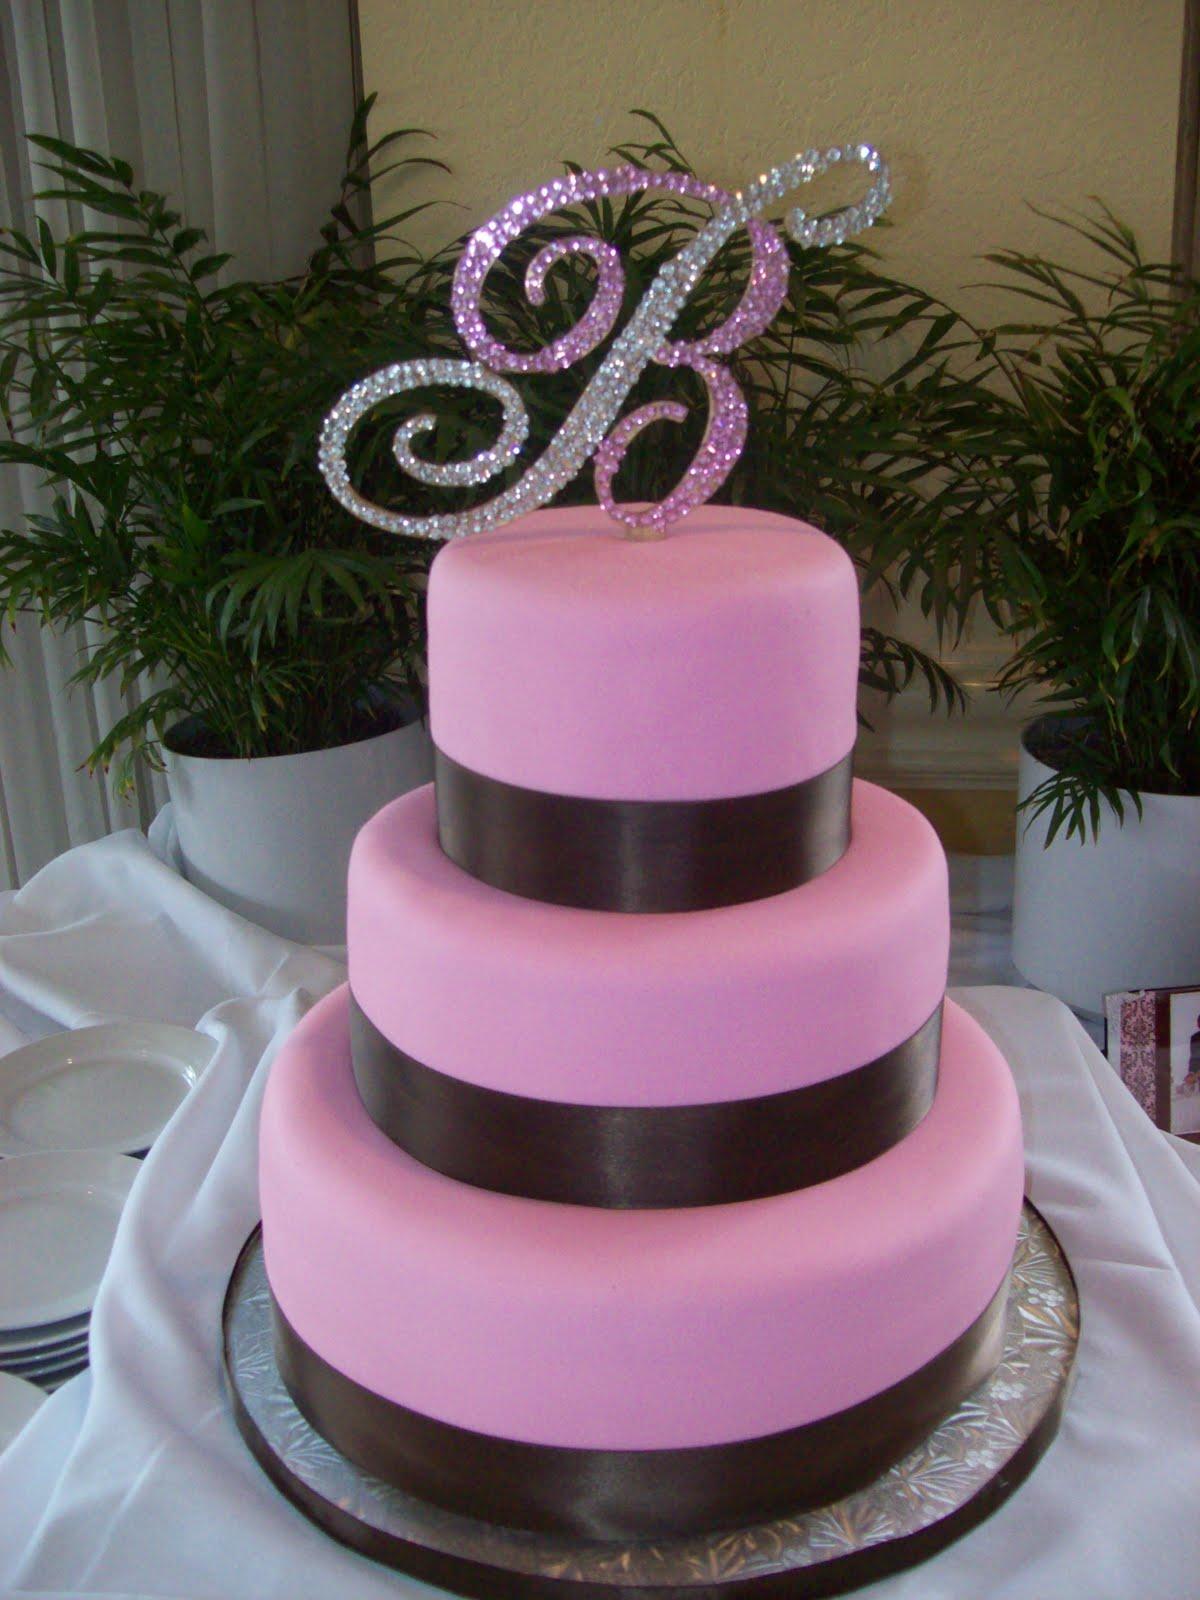 Brown Sugar Custom Cakes Wedding And Birthday Cakes 8 6 11